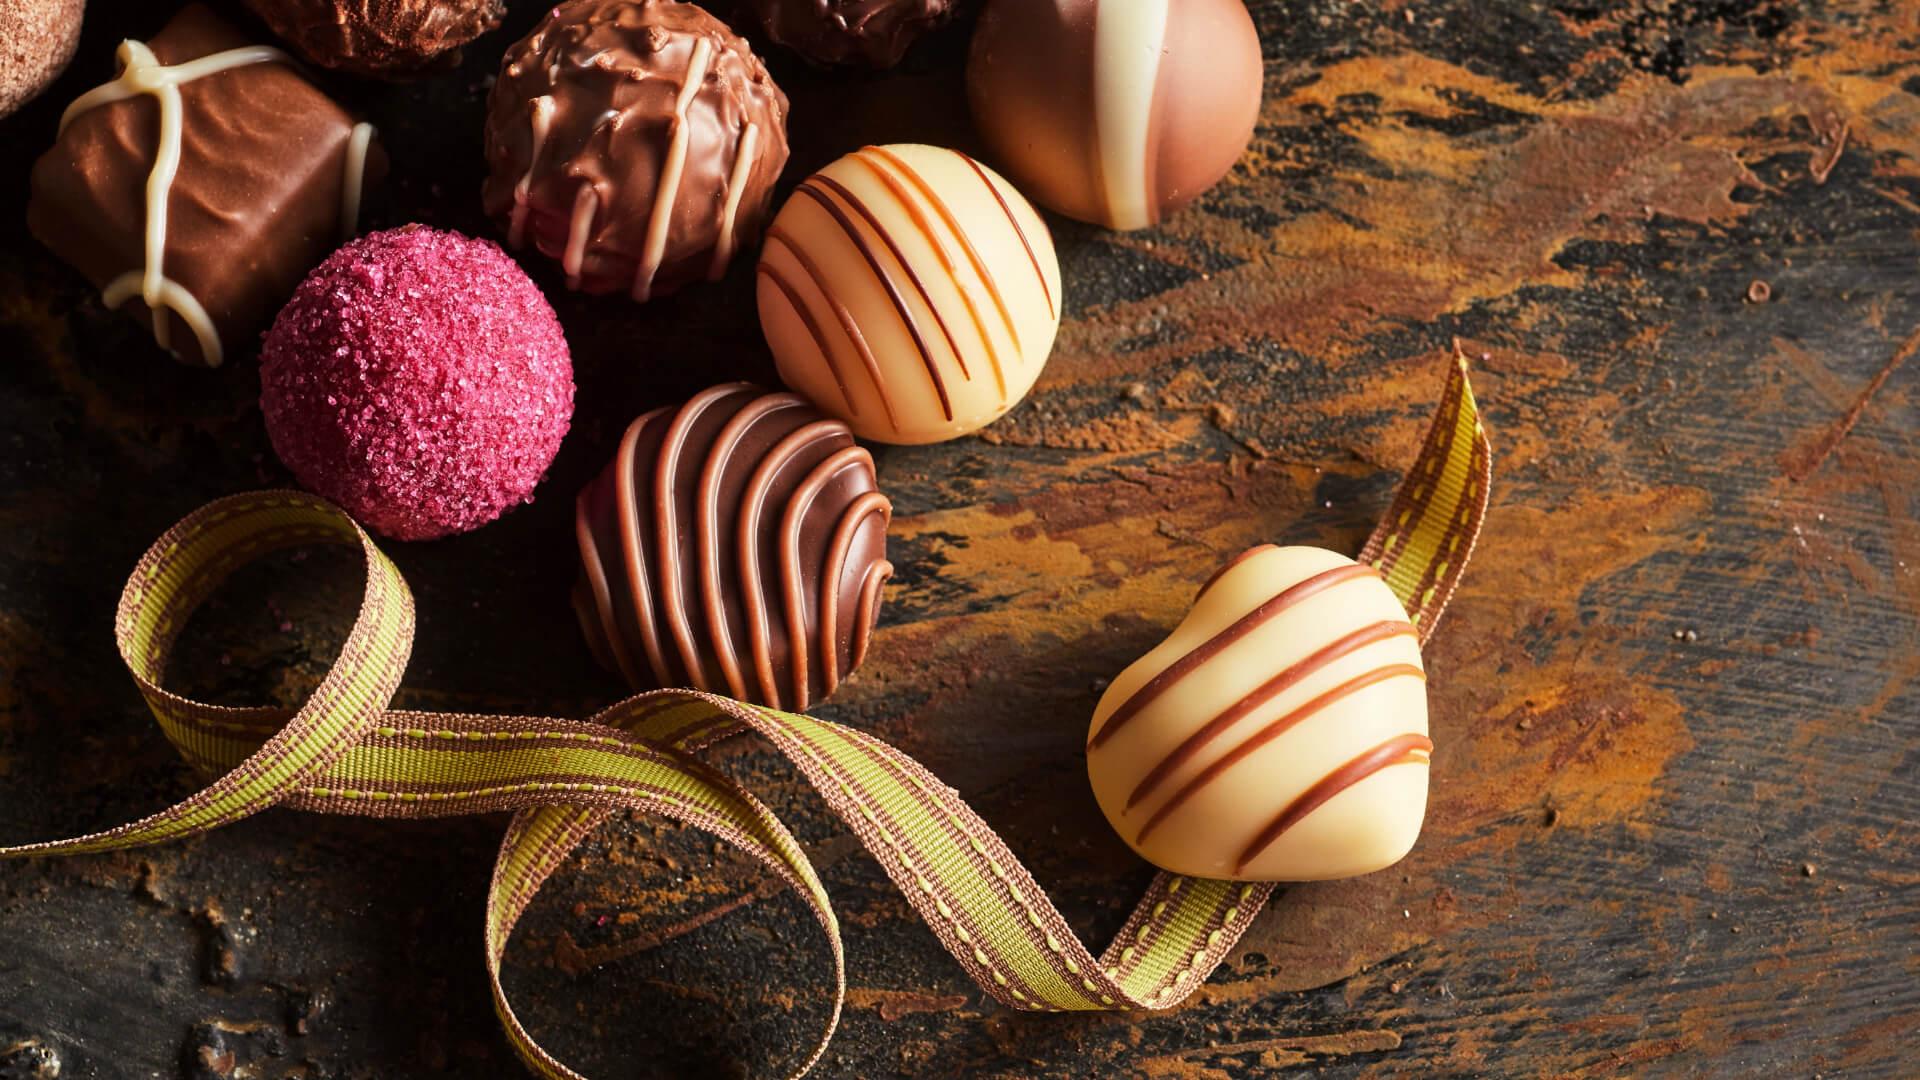 Yaşasın Kakao, Yaşasın Çikolata